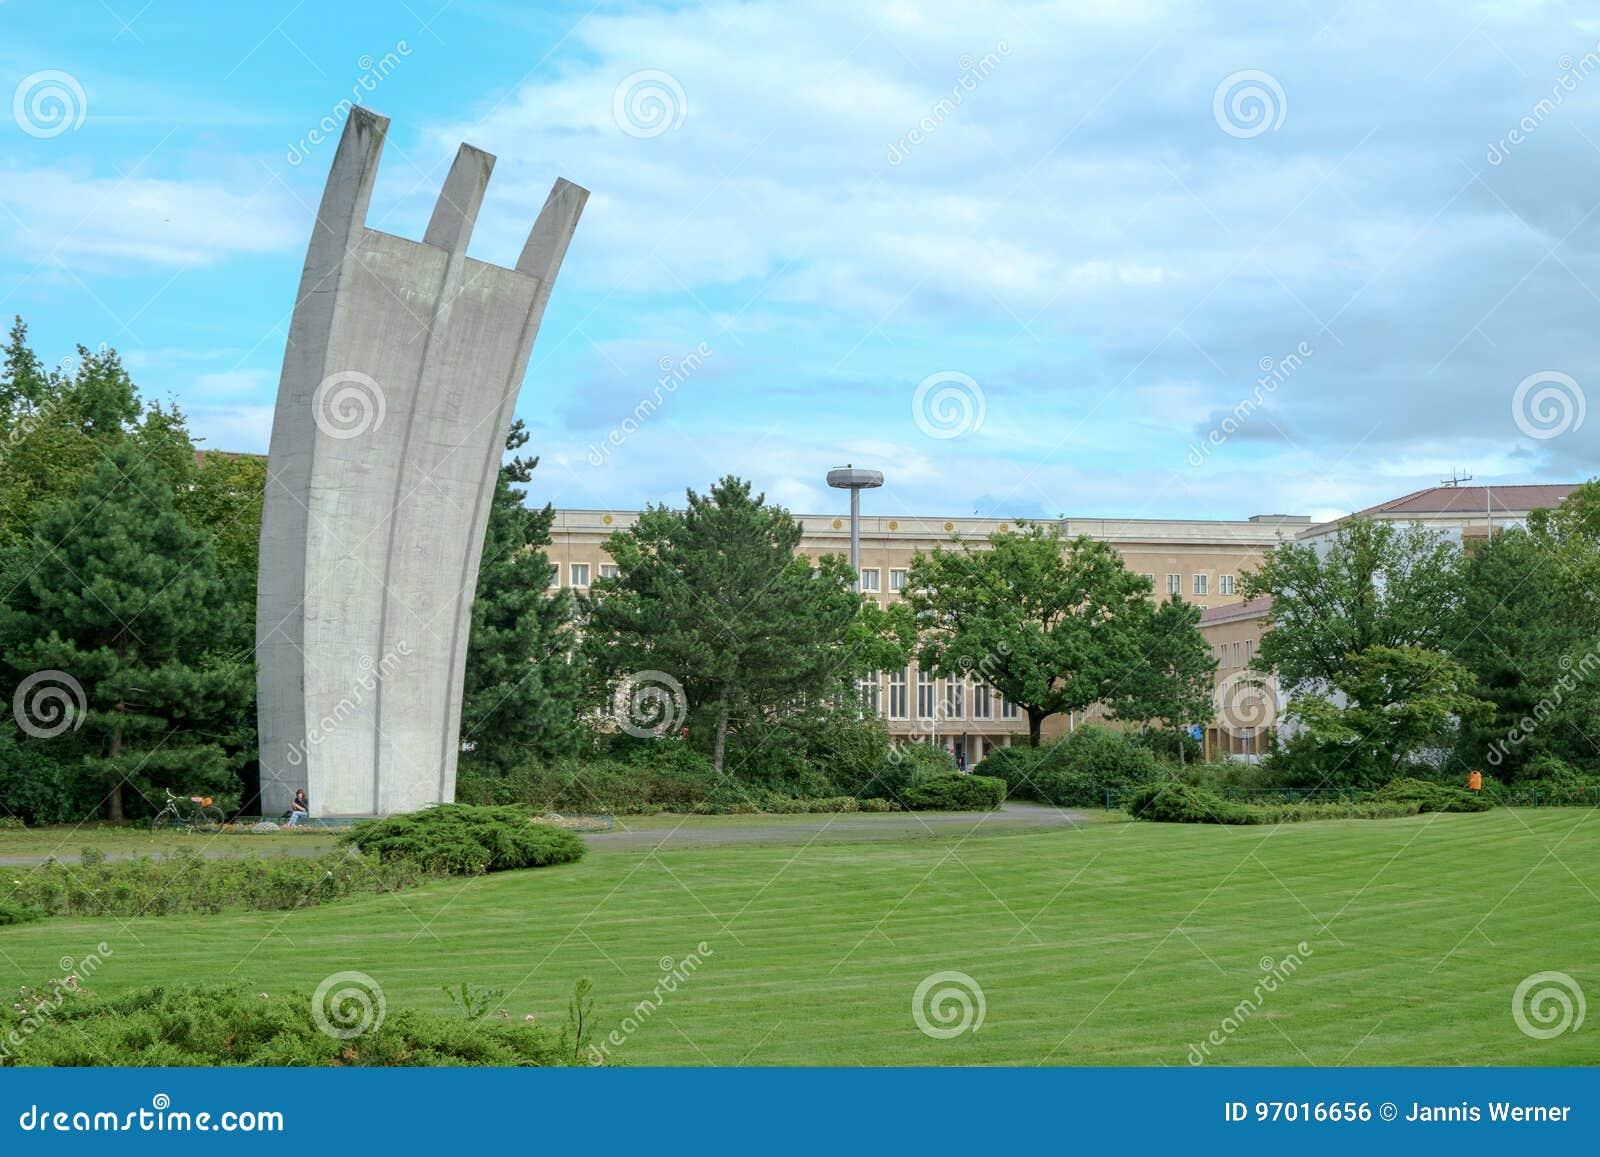 Luftbruckendenkmal Berlin